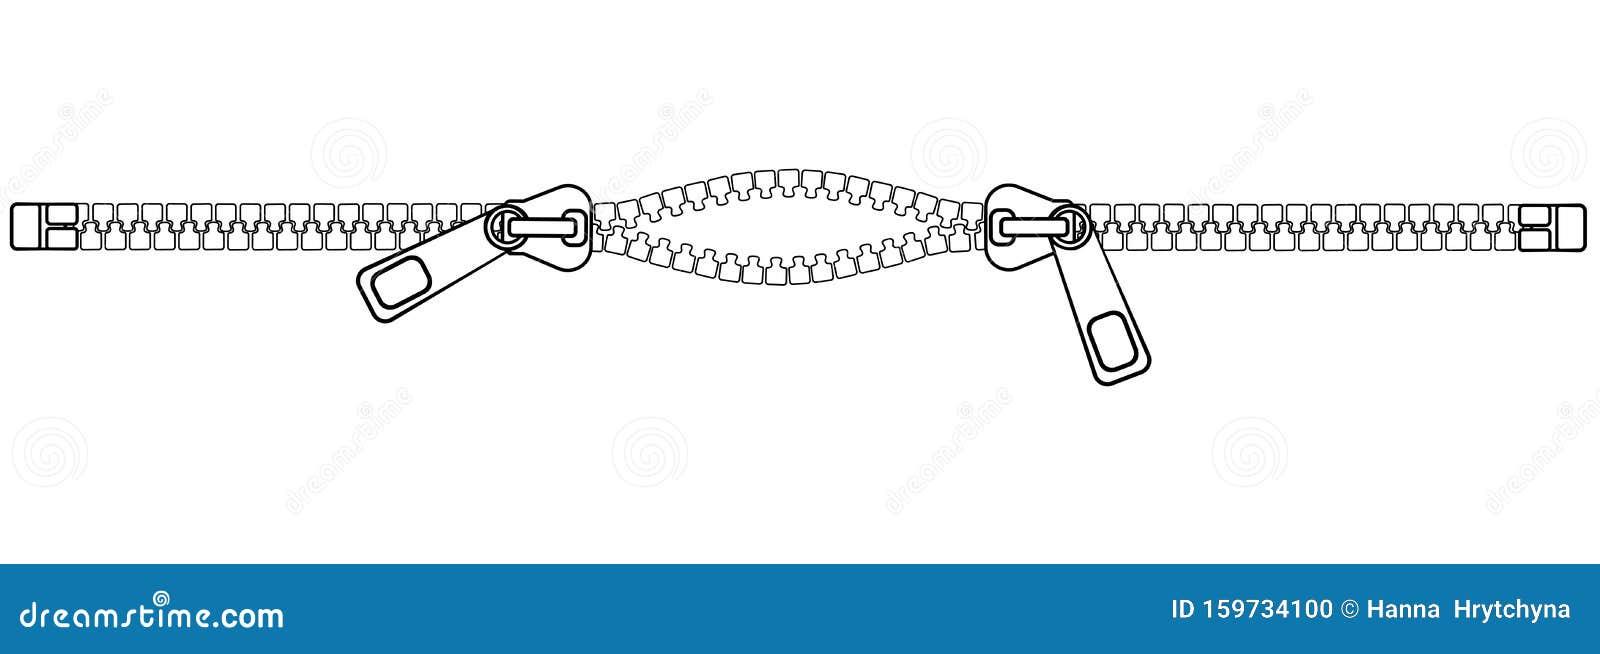 Horizontal Zipper With Two Sliders Slightly Ajar Half Open